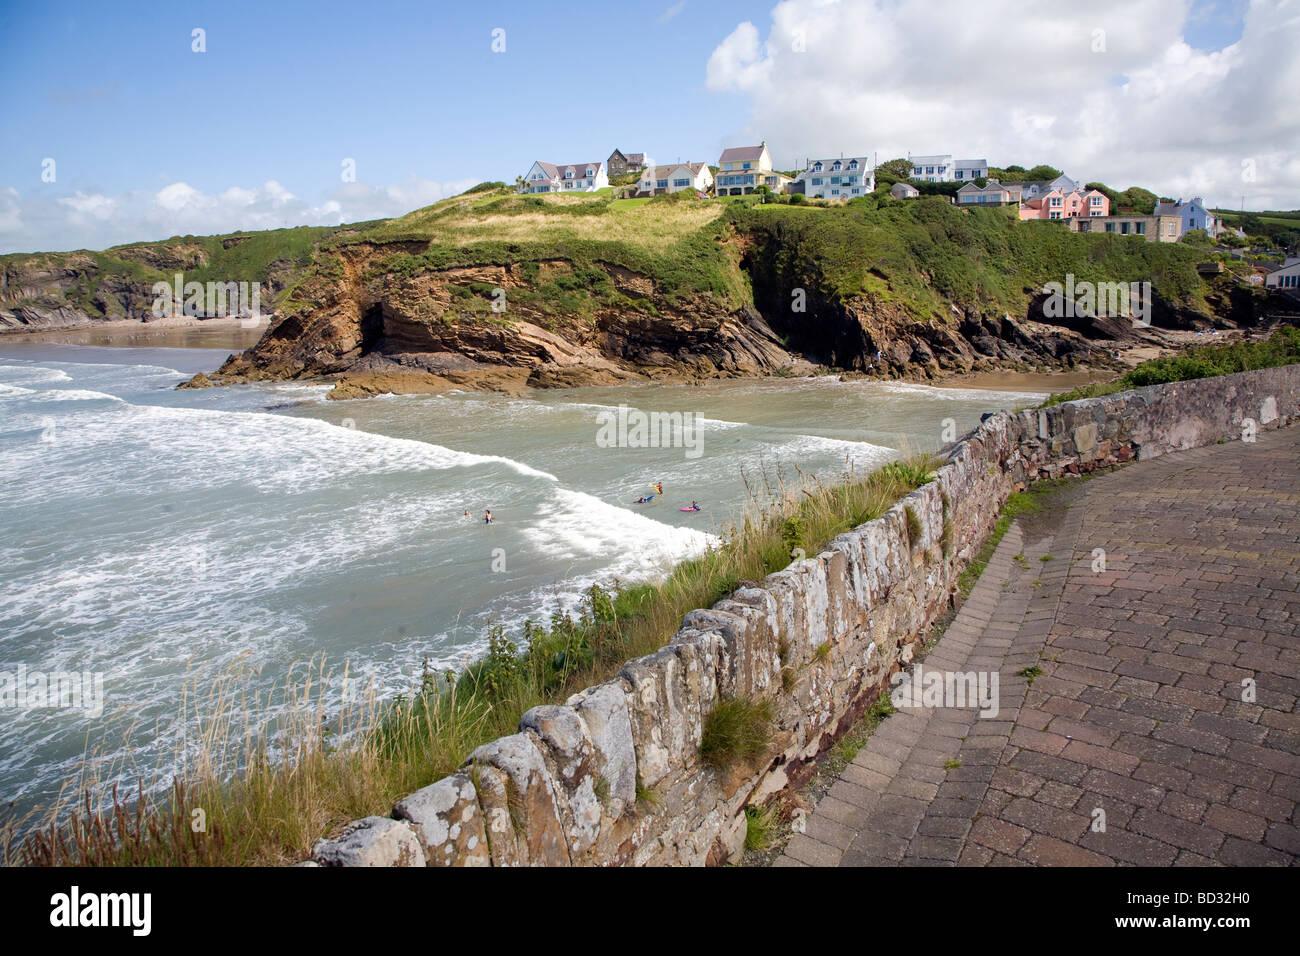 Coast Little Haven Pembrokeshire Wales UK - Stock Image